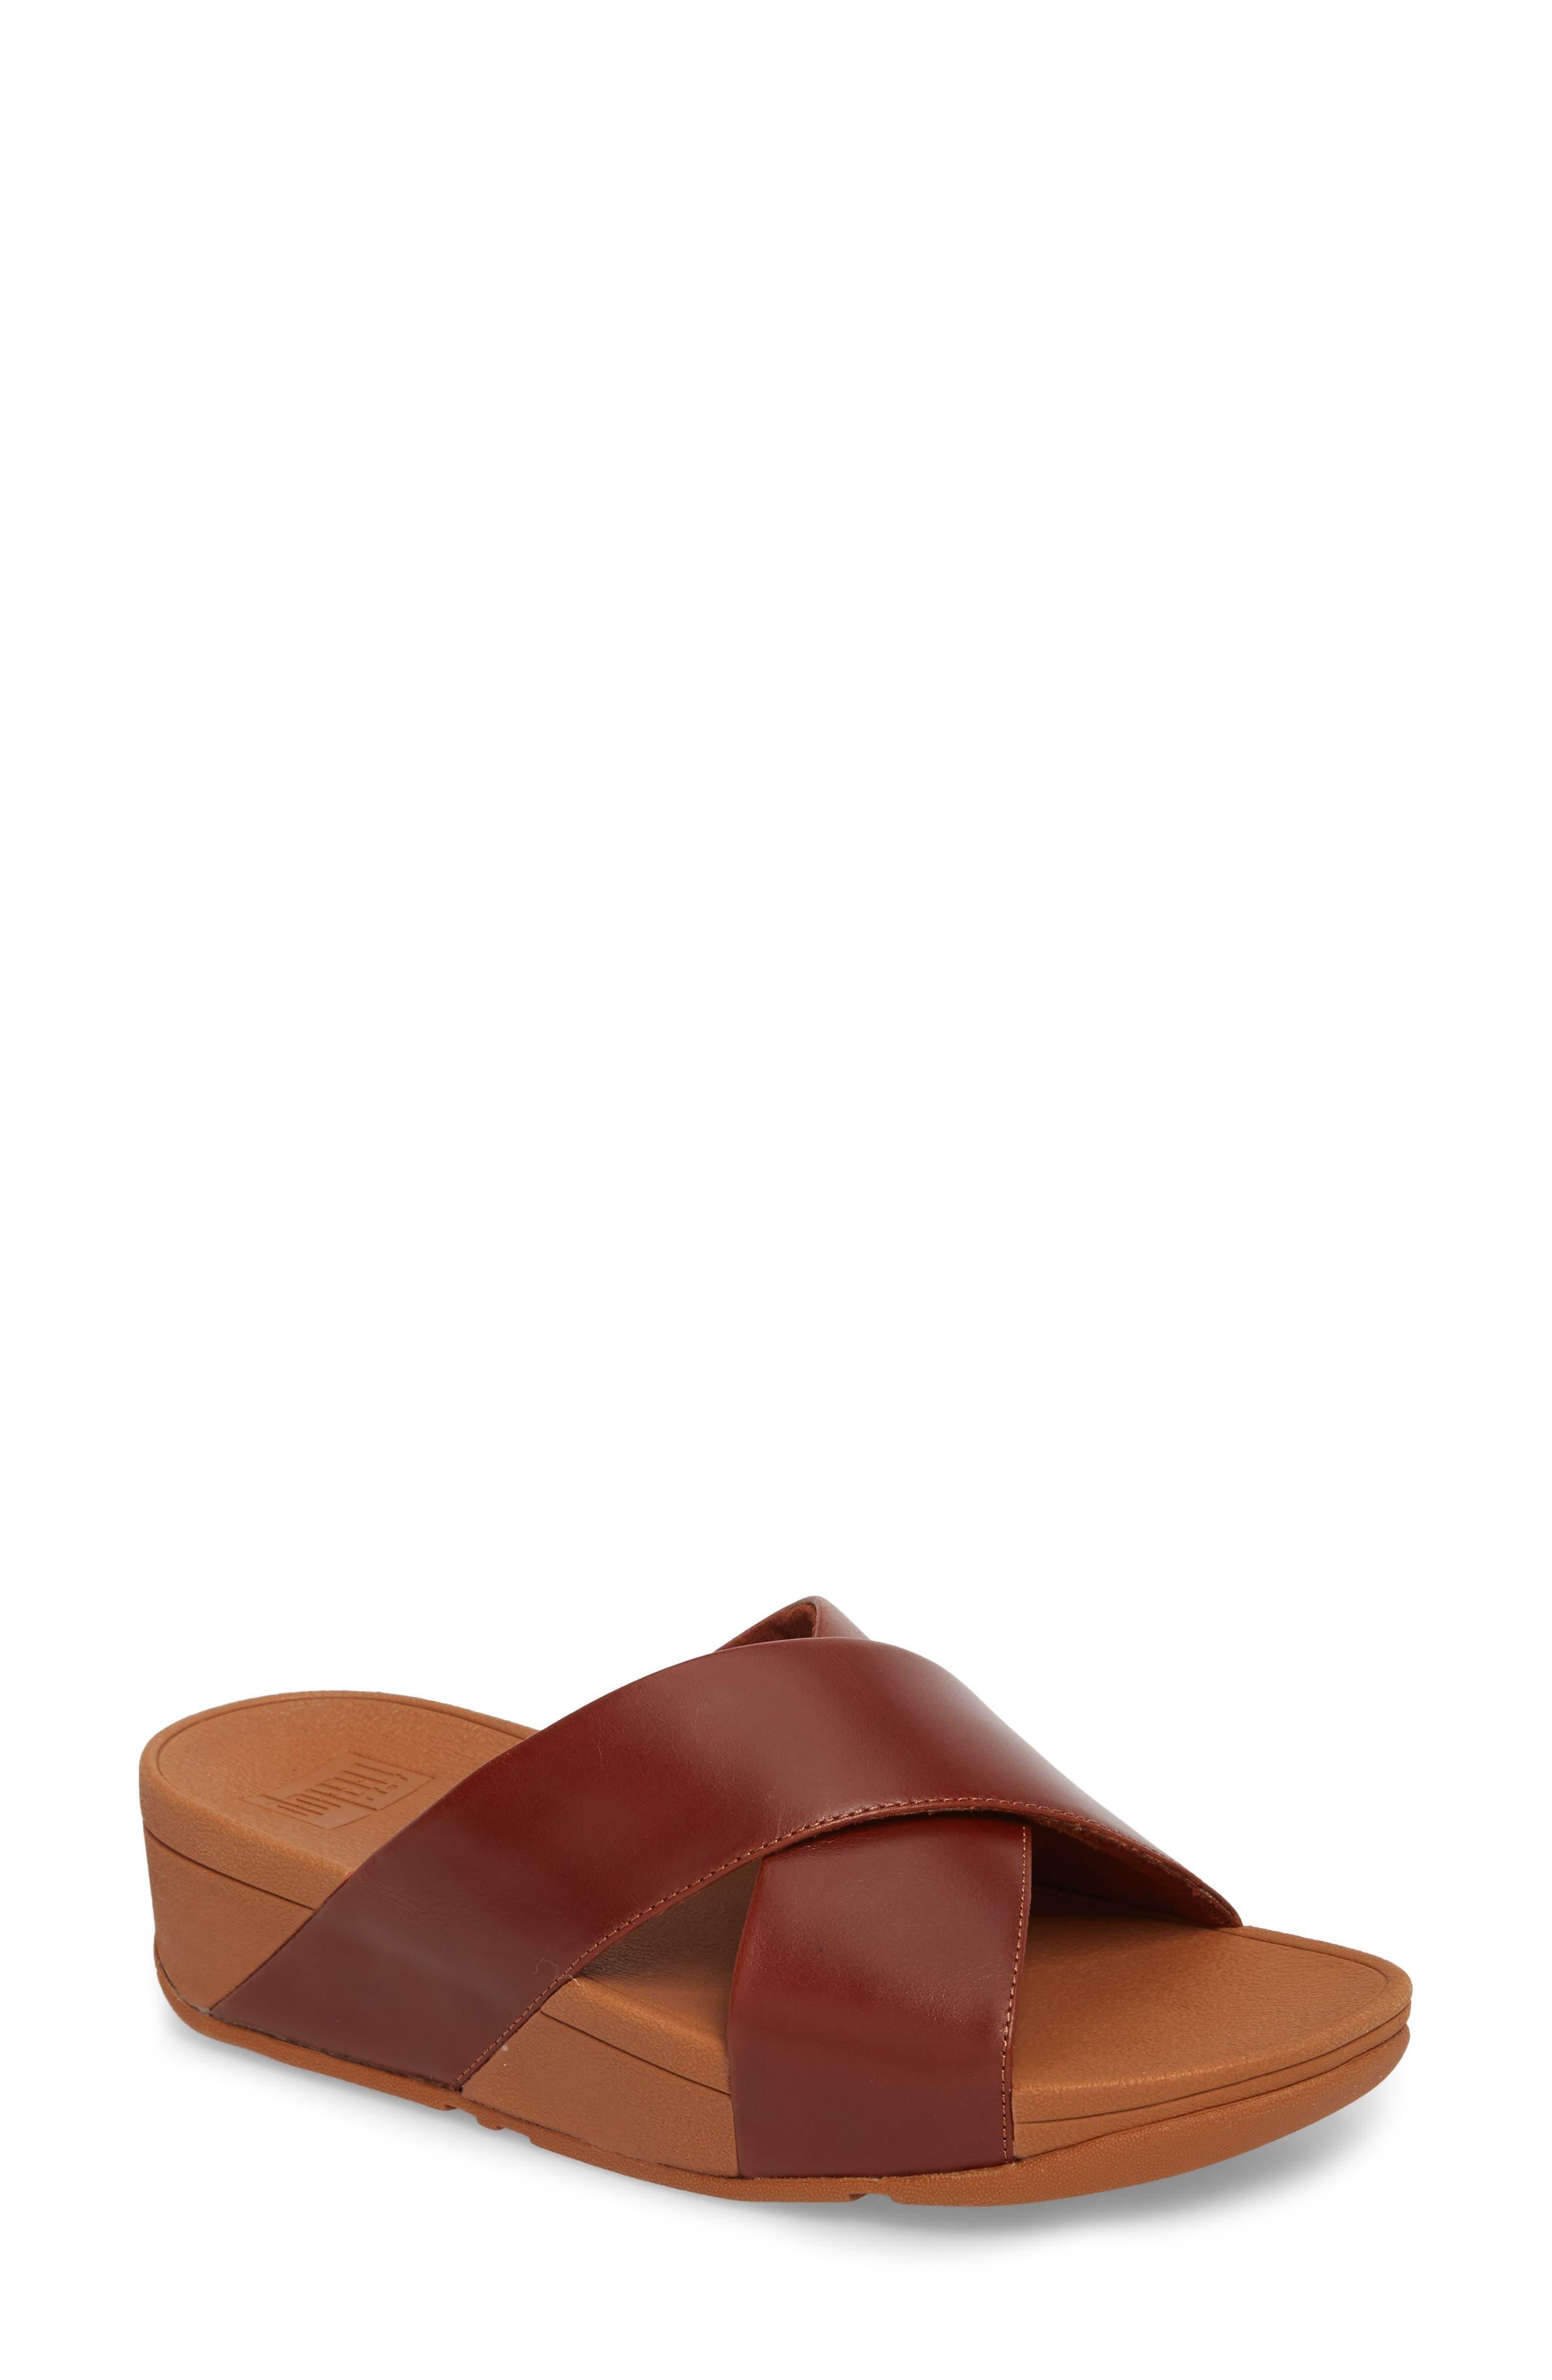 Lulu Cross Slide Sandal,                             Main thumbnail 1, color,                             Cognac